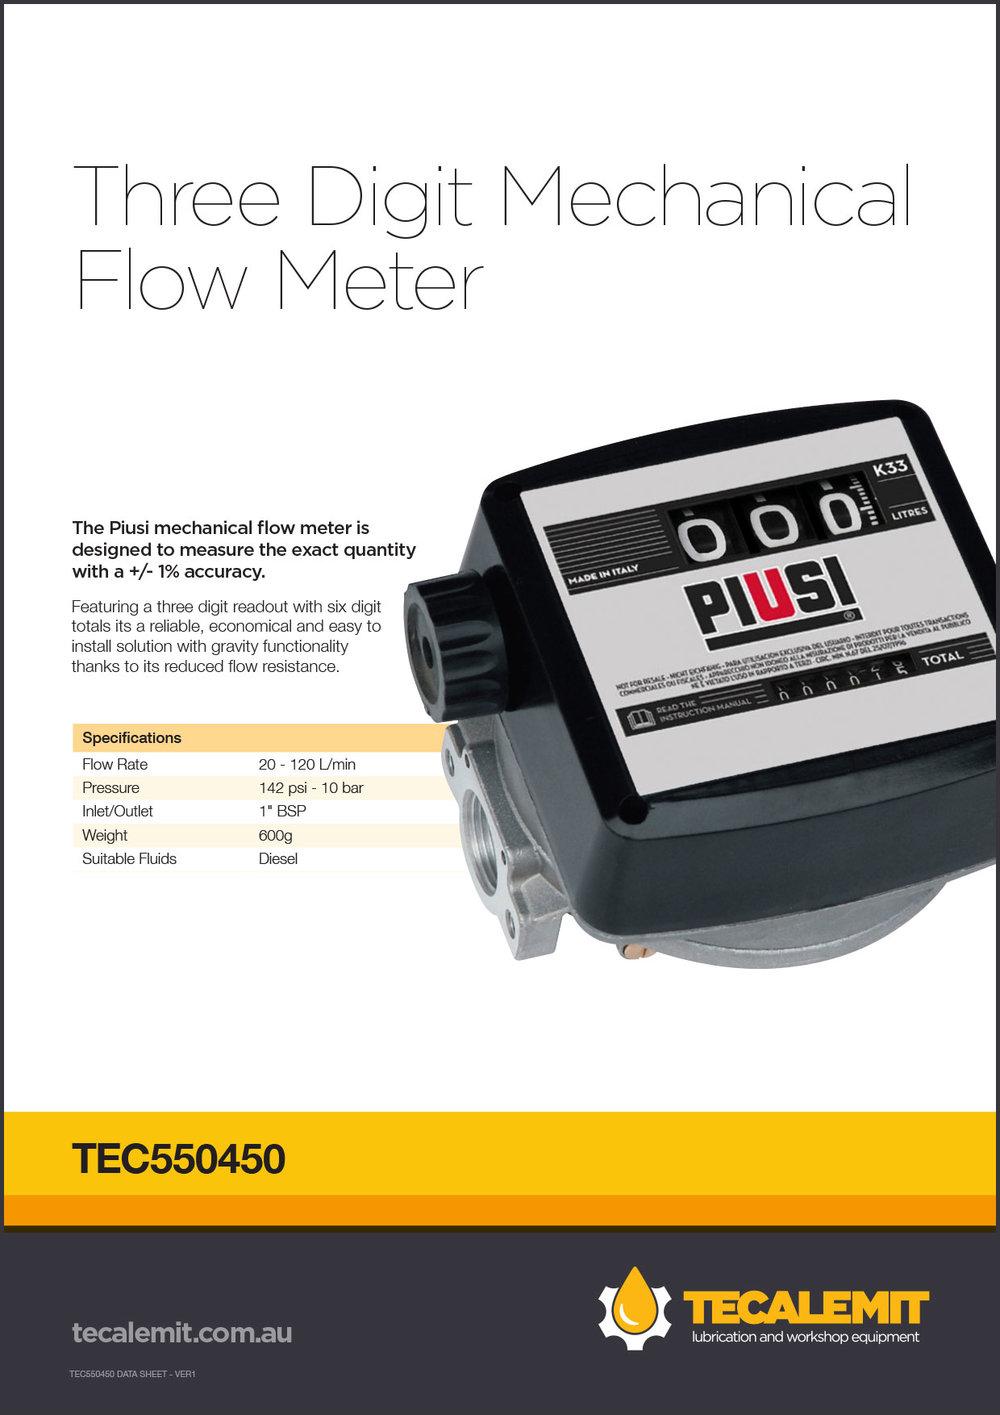 TEC550450 Product Info